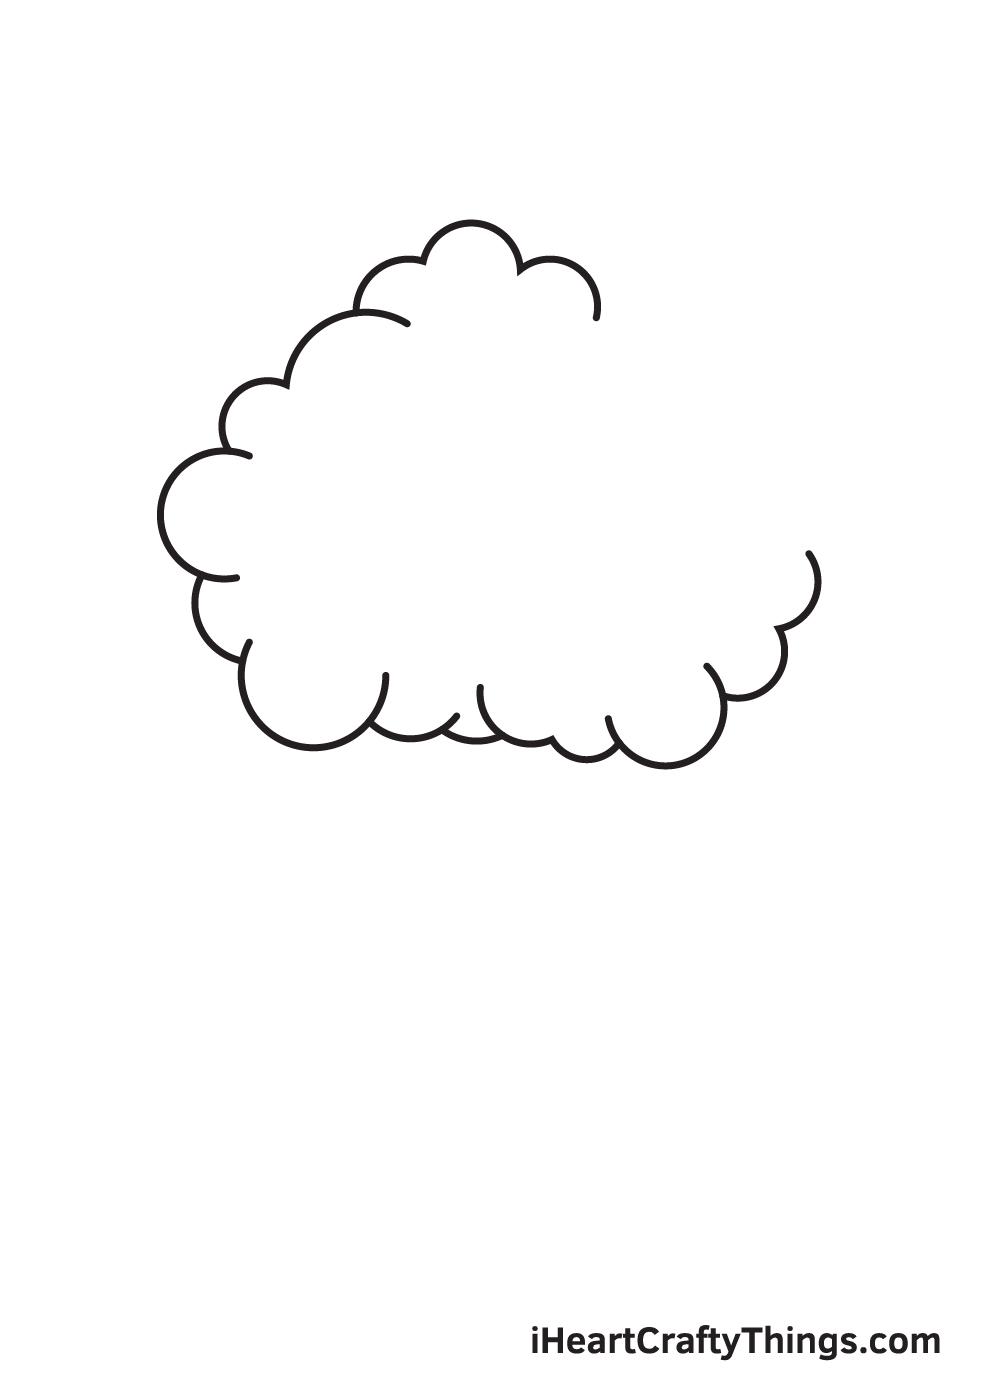 tree drawing step 6